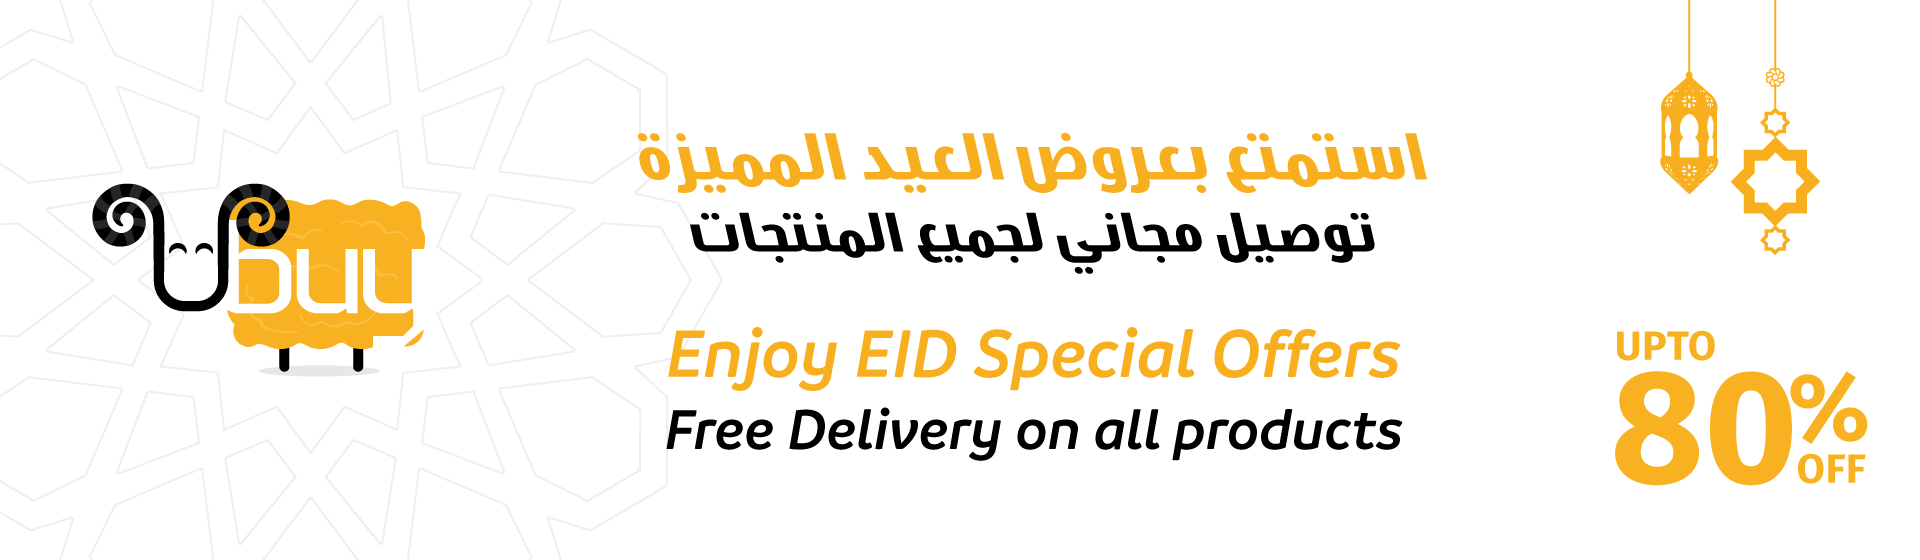 eid sales by ubuy